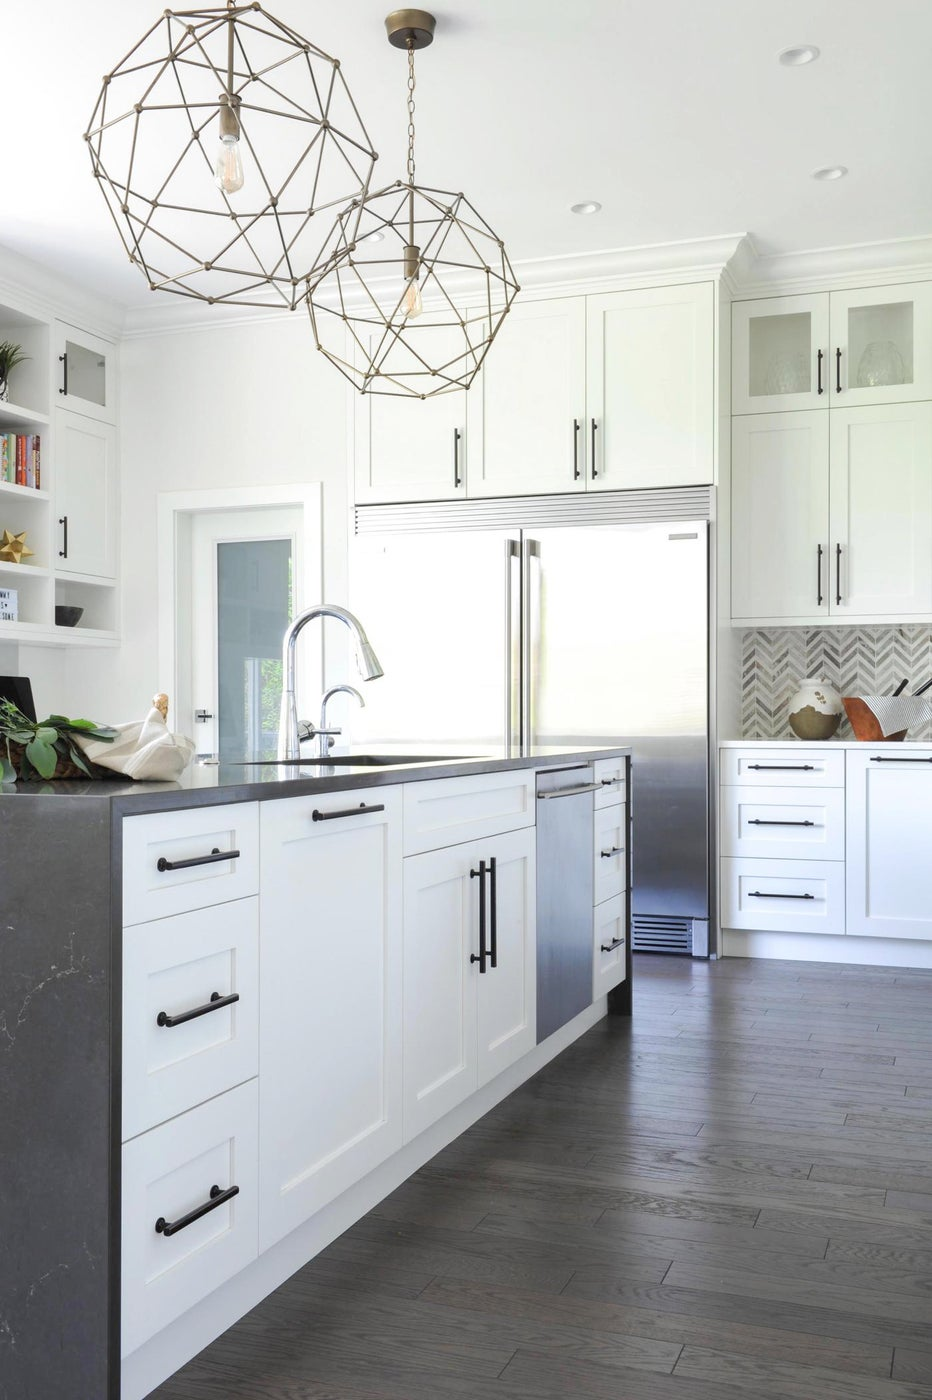 Modern kitchen with dramatic pendant lighting